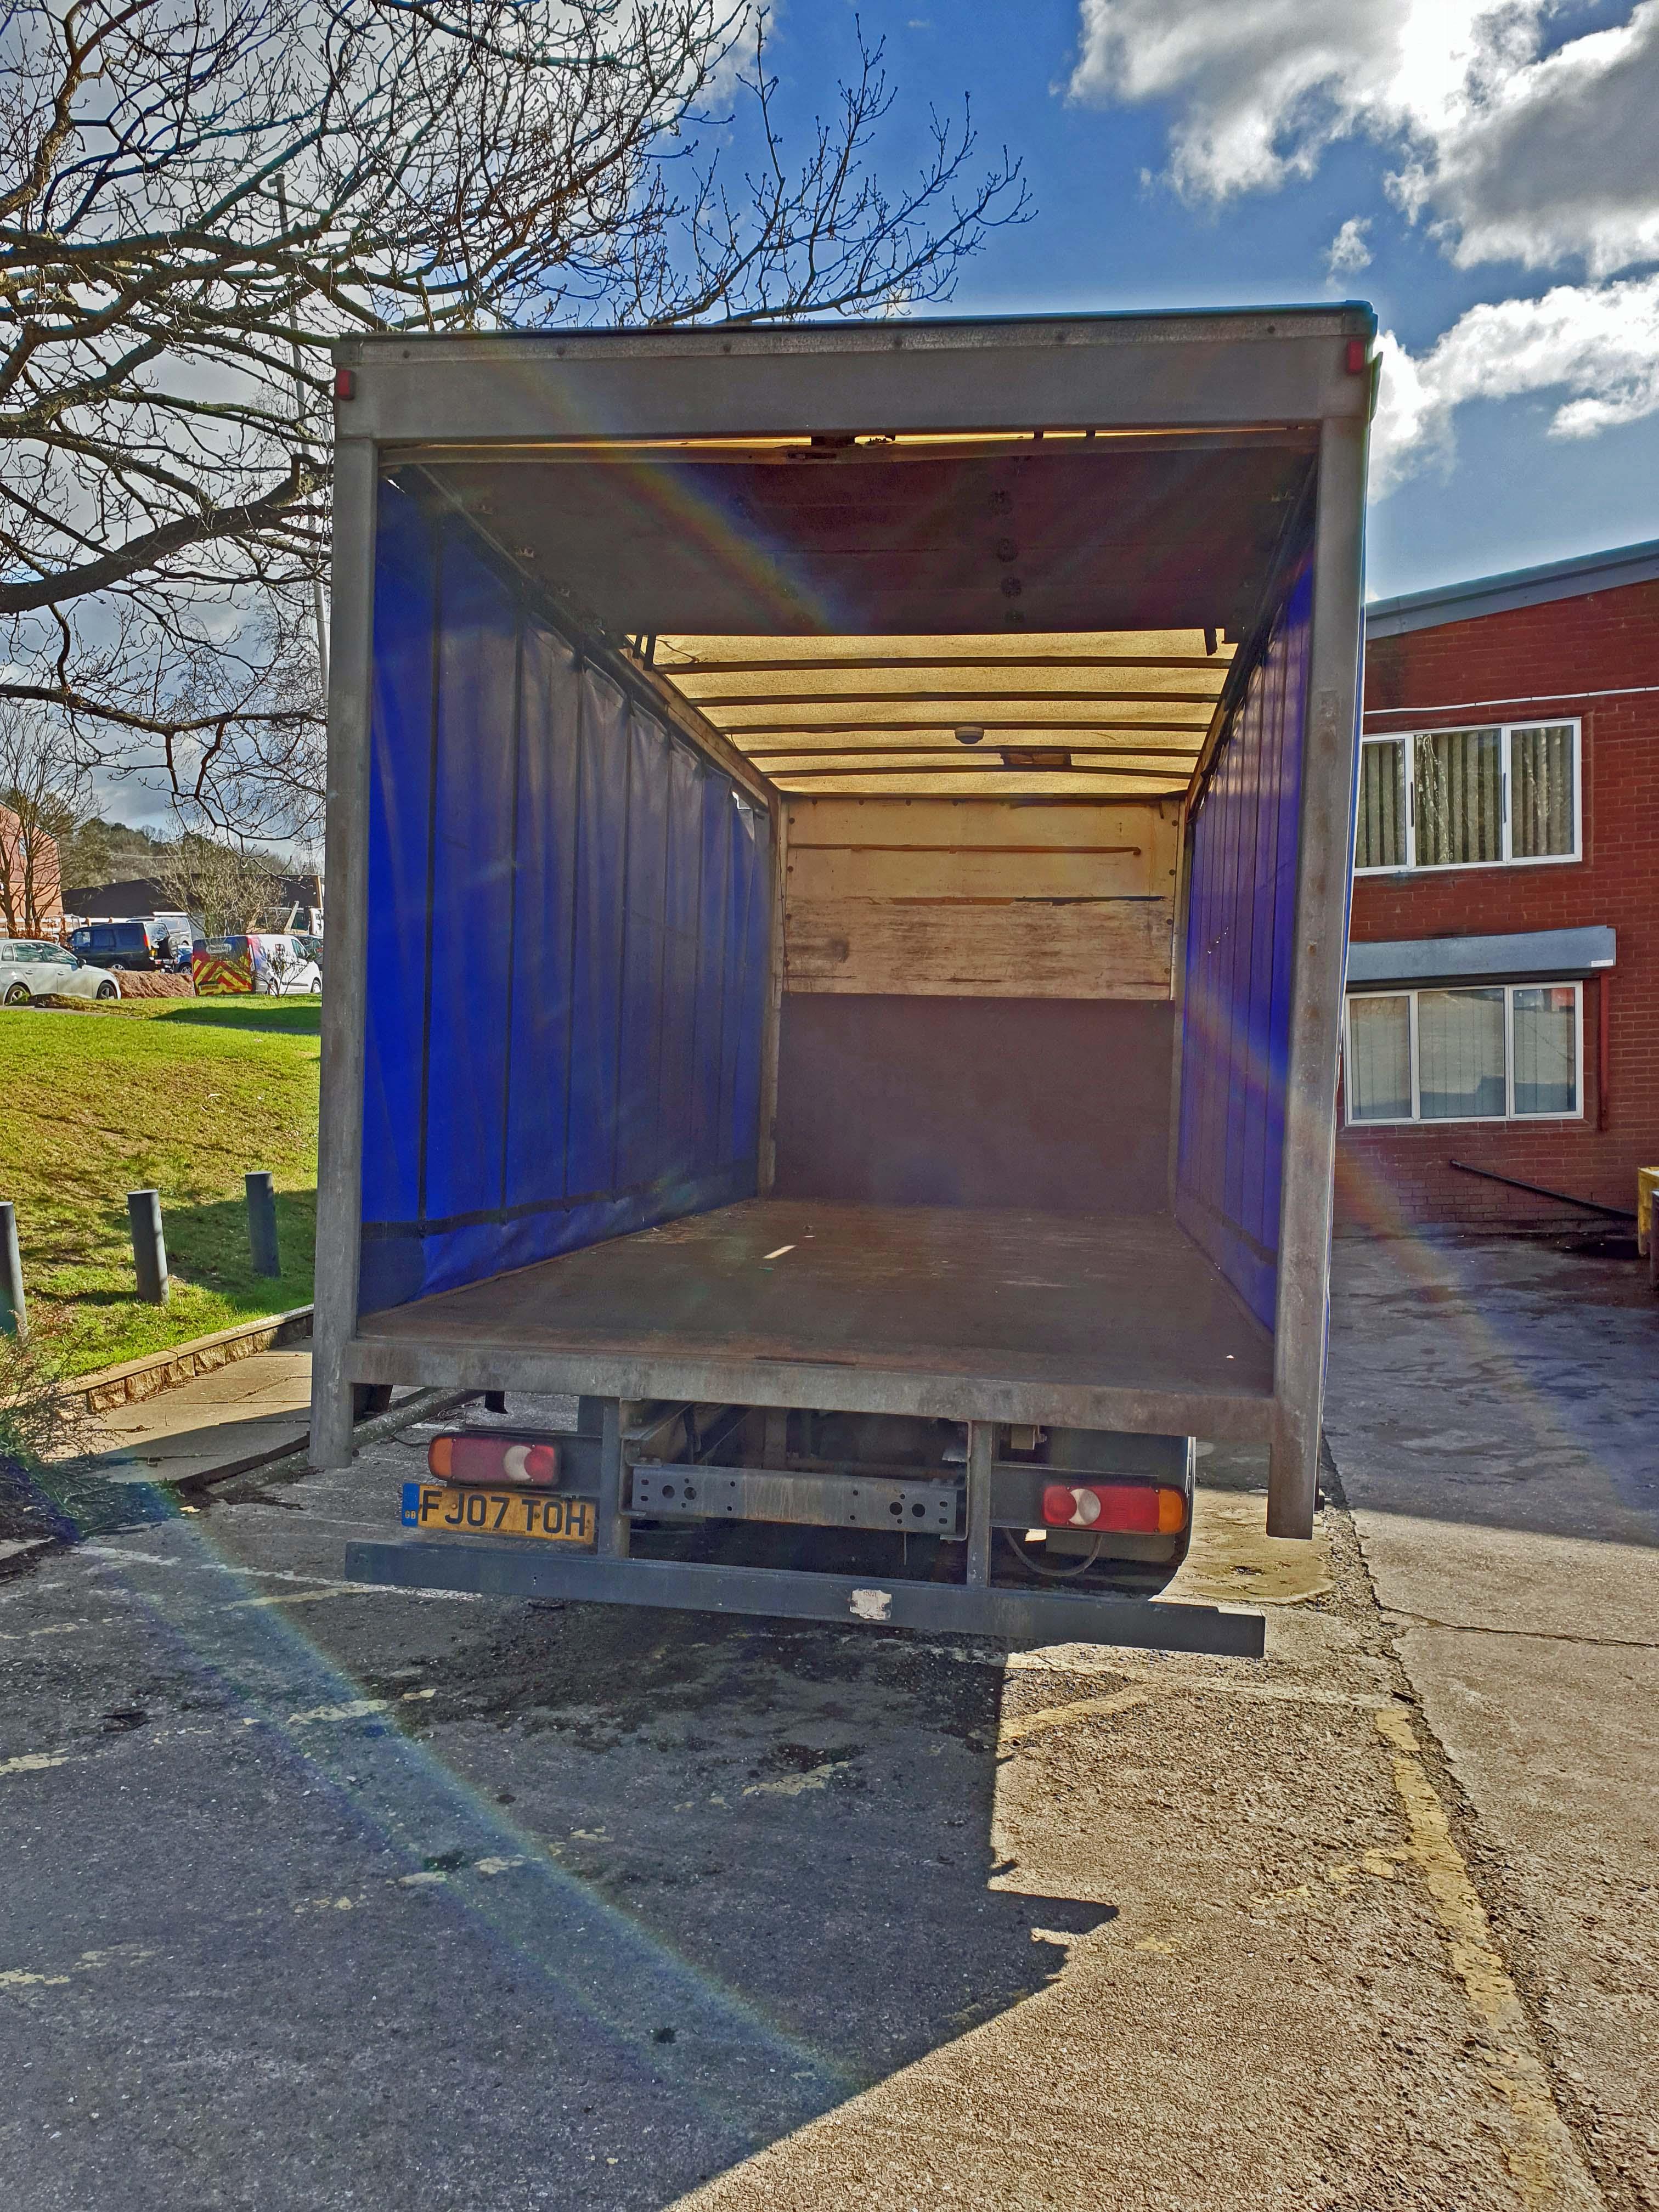 A DAF FA LF45.160 08 E 4500cc 4x2 7.5-Tonne Curtainside Truck, Registration No. FJ07 TOH, First - Image 4 of 9